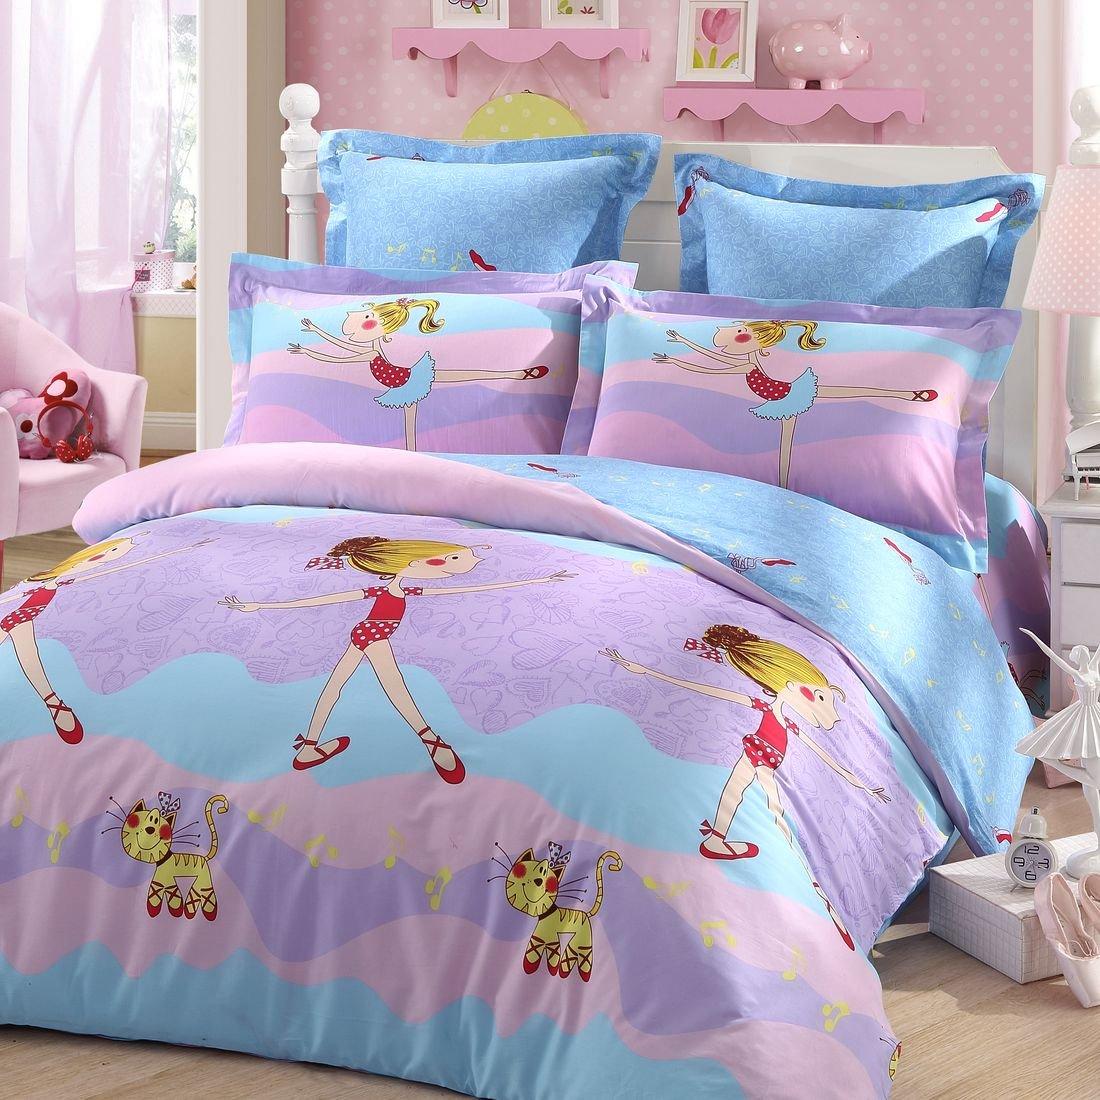 LOVO KIDS Purple Girl Dance 100% Cotton 300-Thread-Count Bedding Sheet Set 3pcs 1x Duvet Cover,1x Flat sheet & 1x Pillowcase Twin